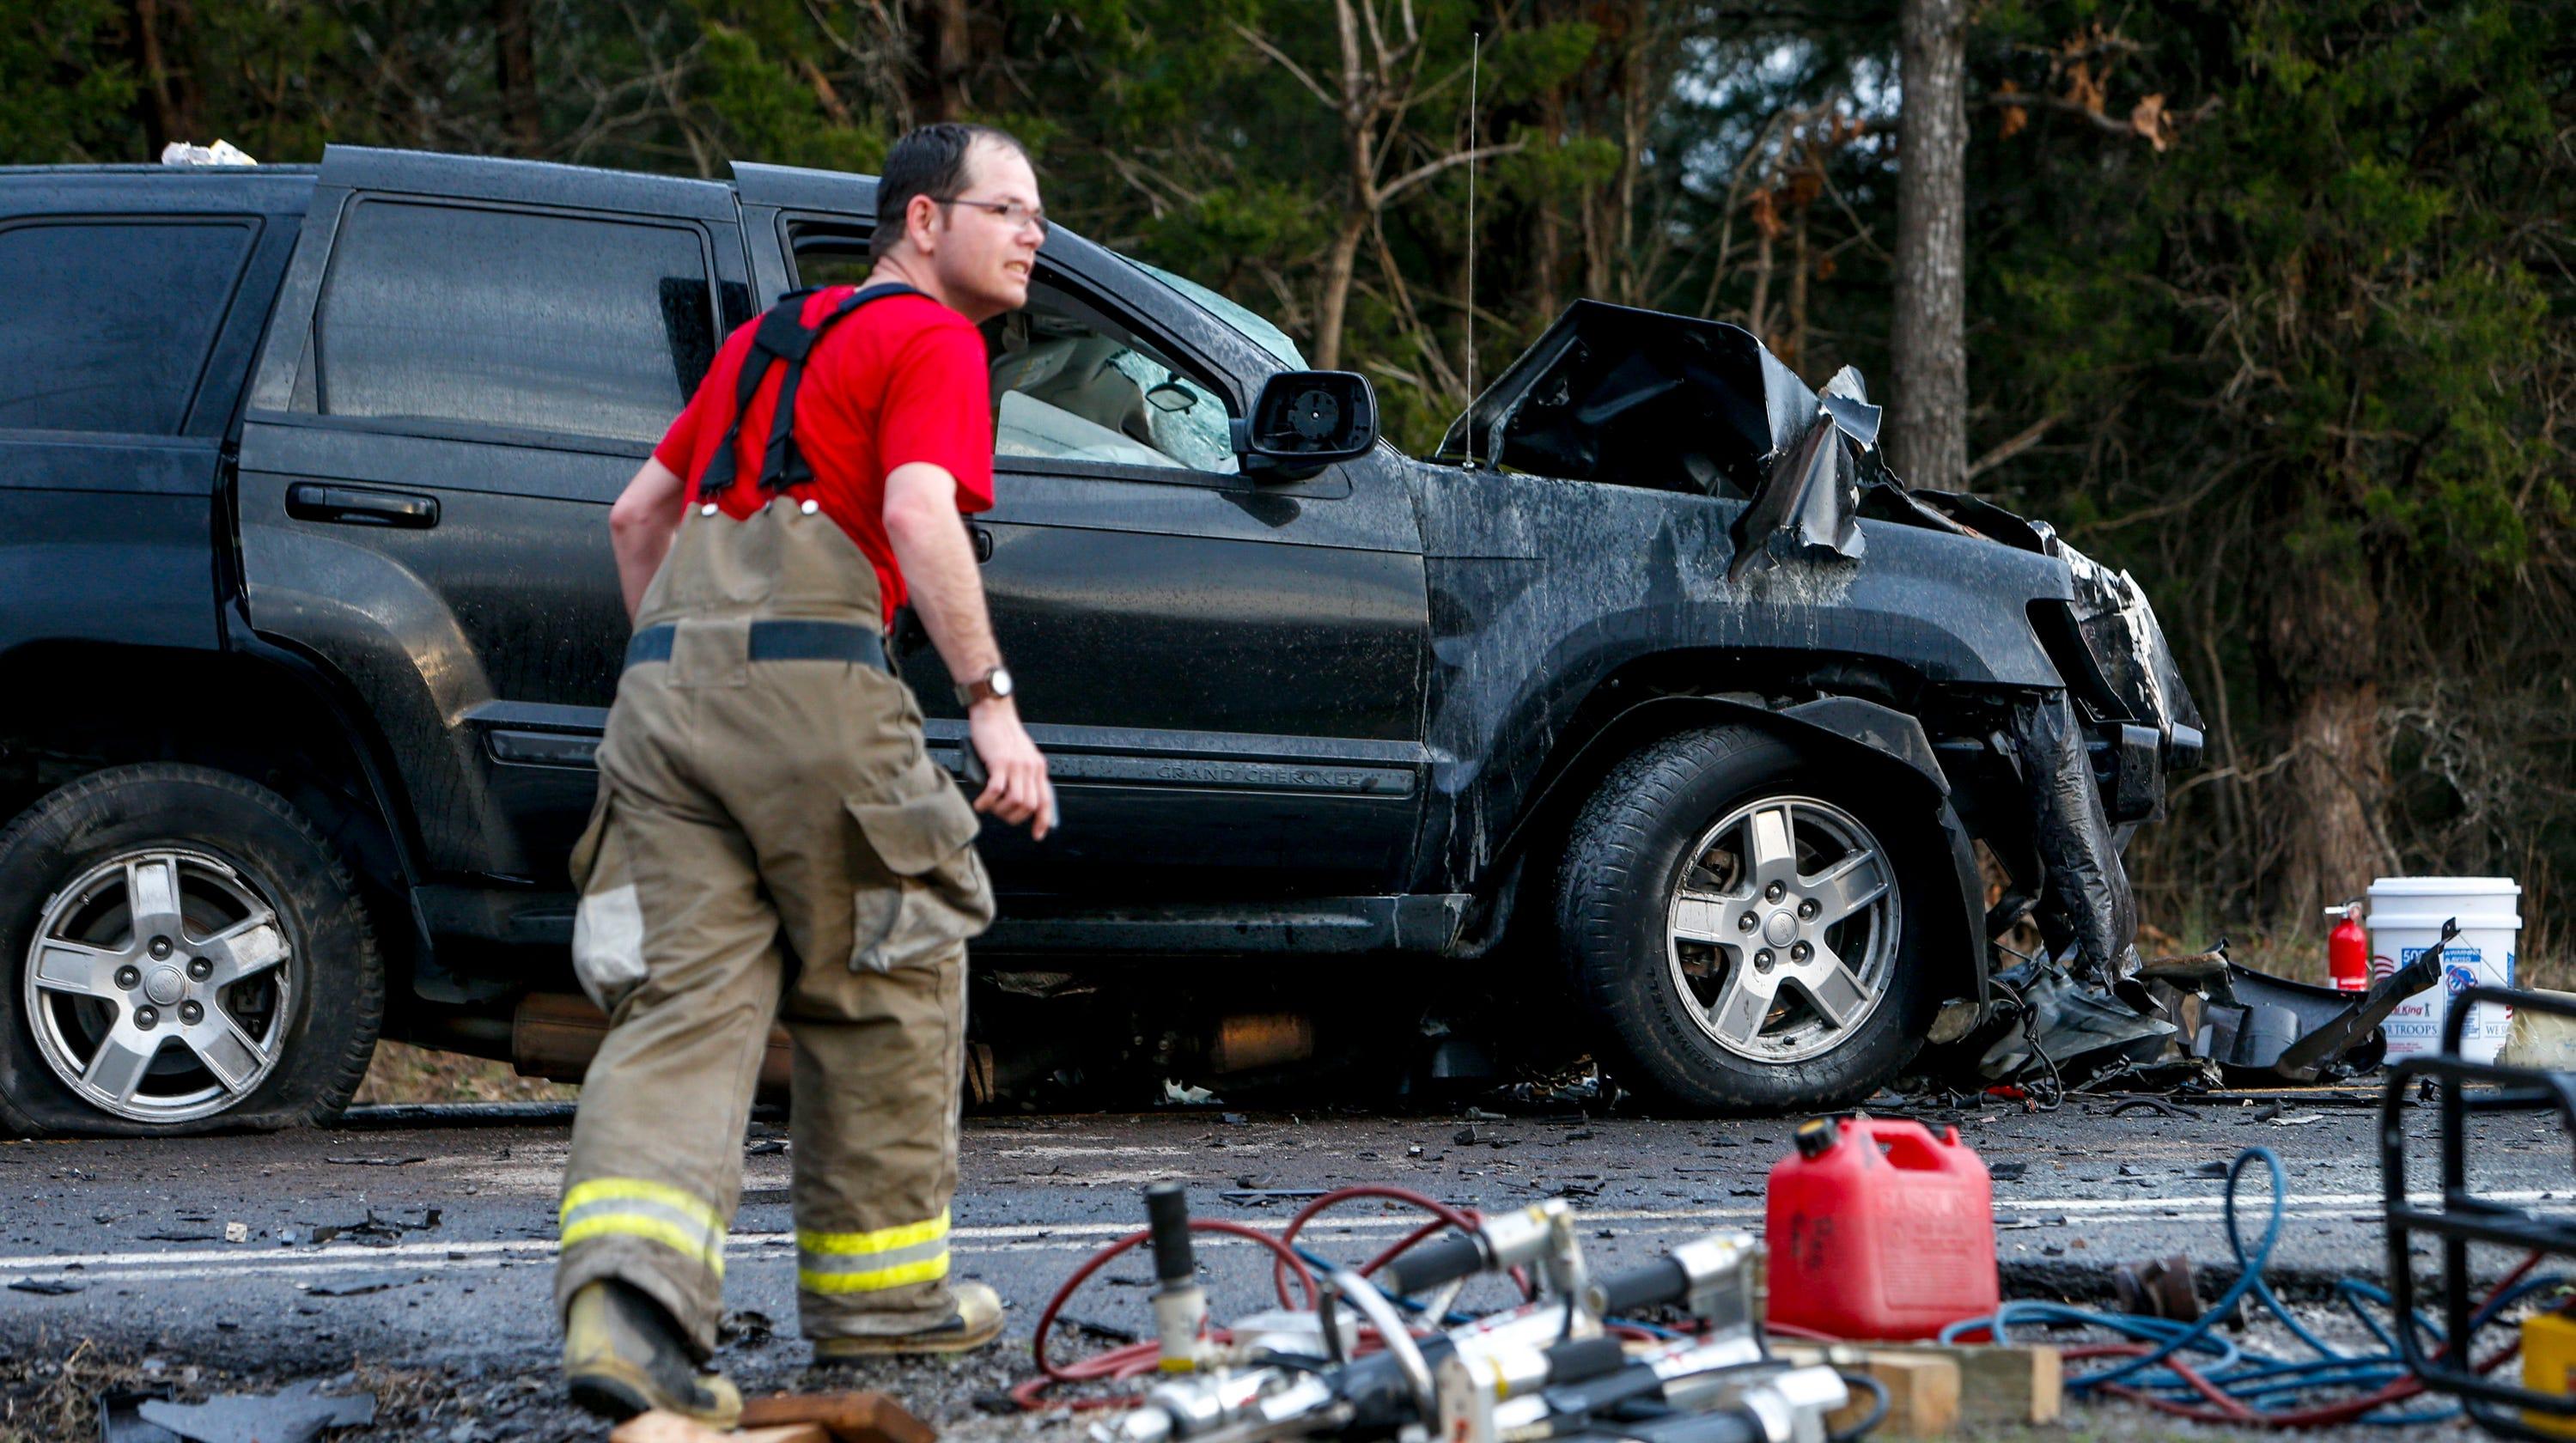 Lylewood Road fatal crash: Witnesses saw speeding Jeep before wreck